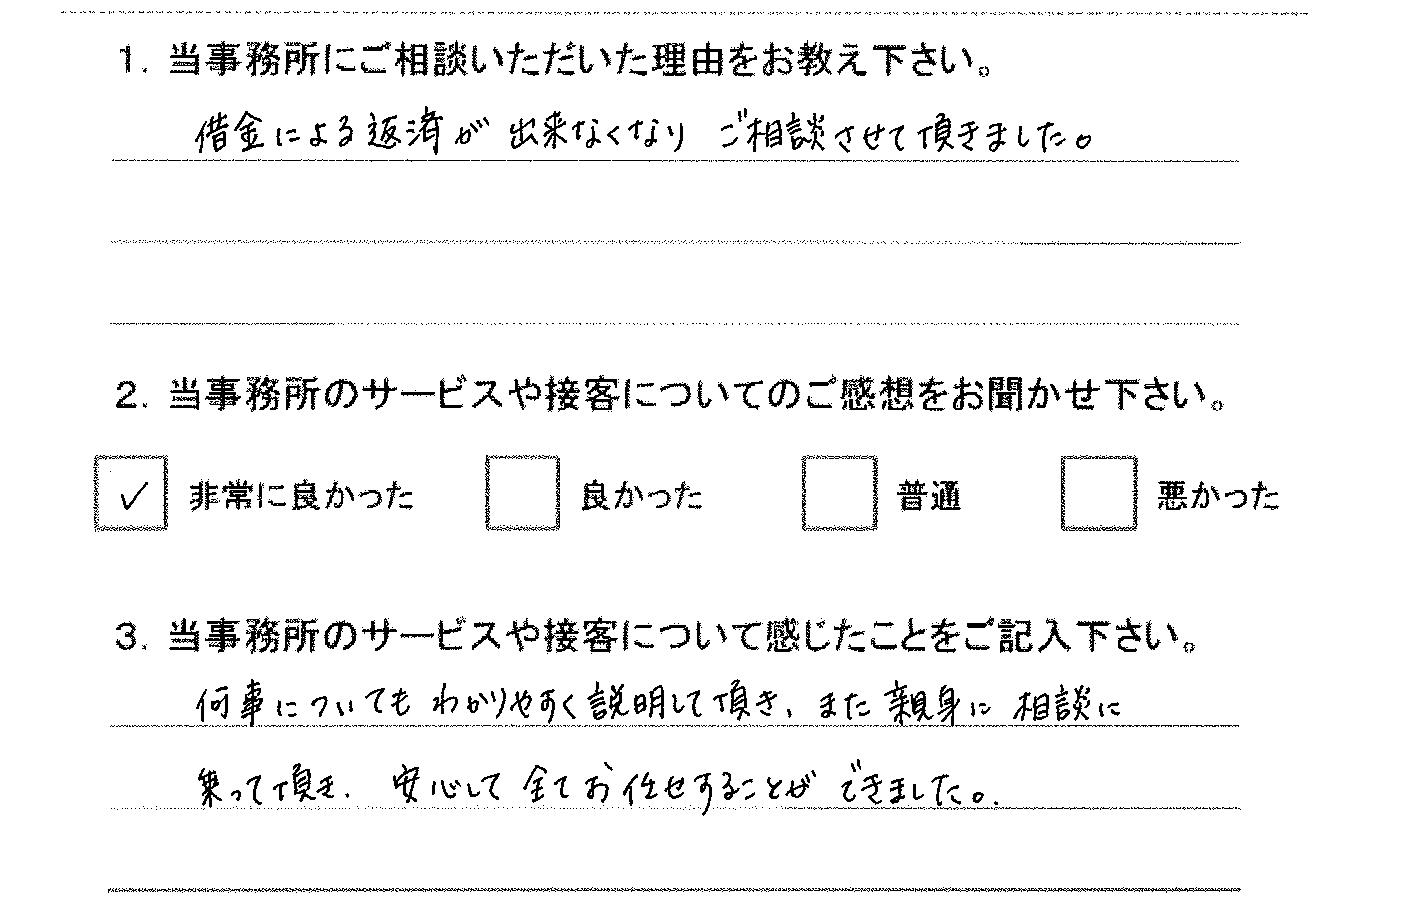 201507_01